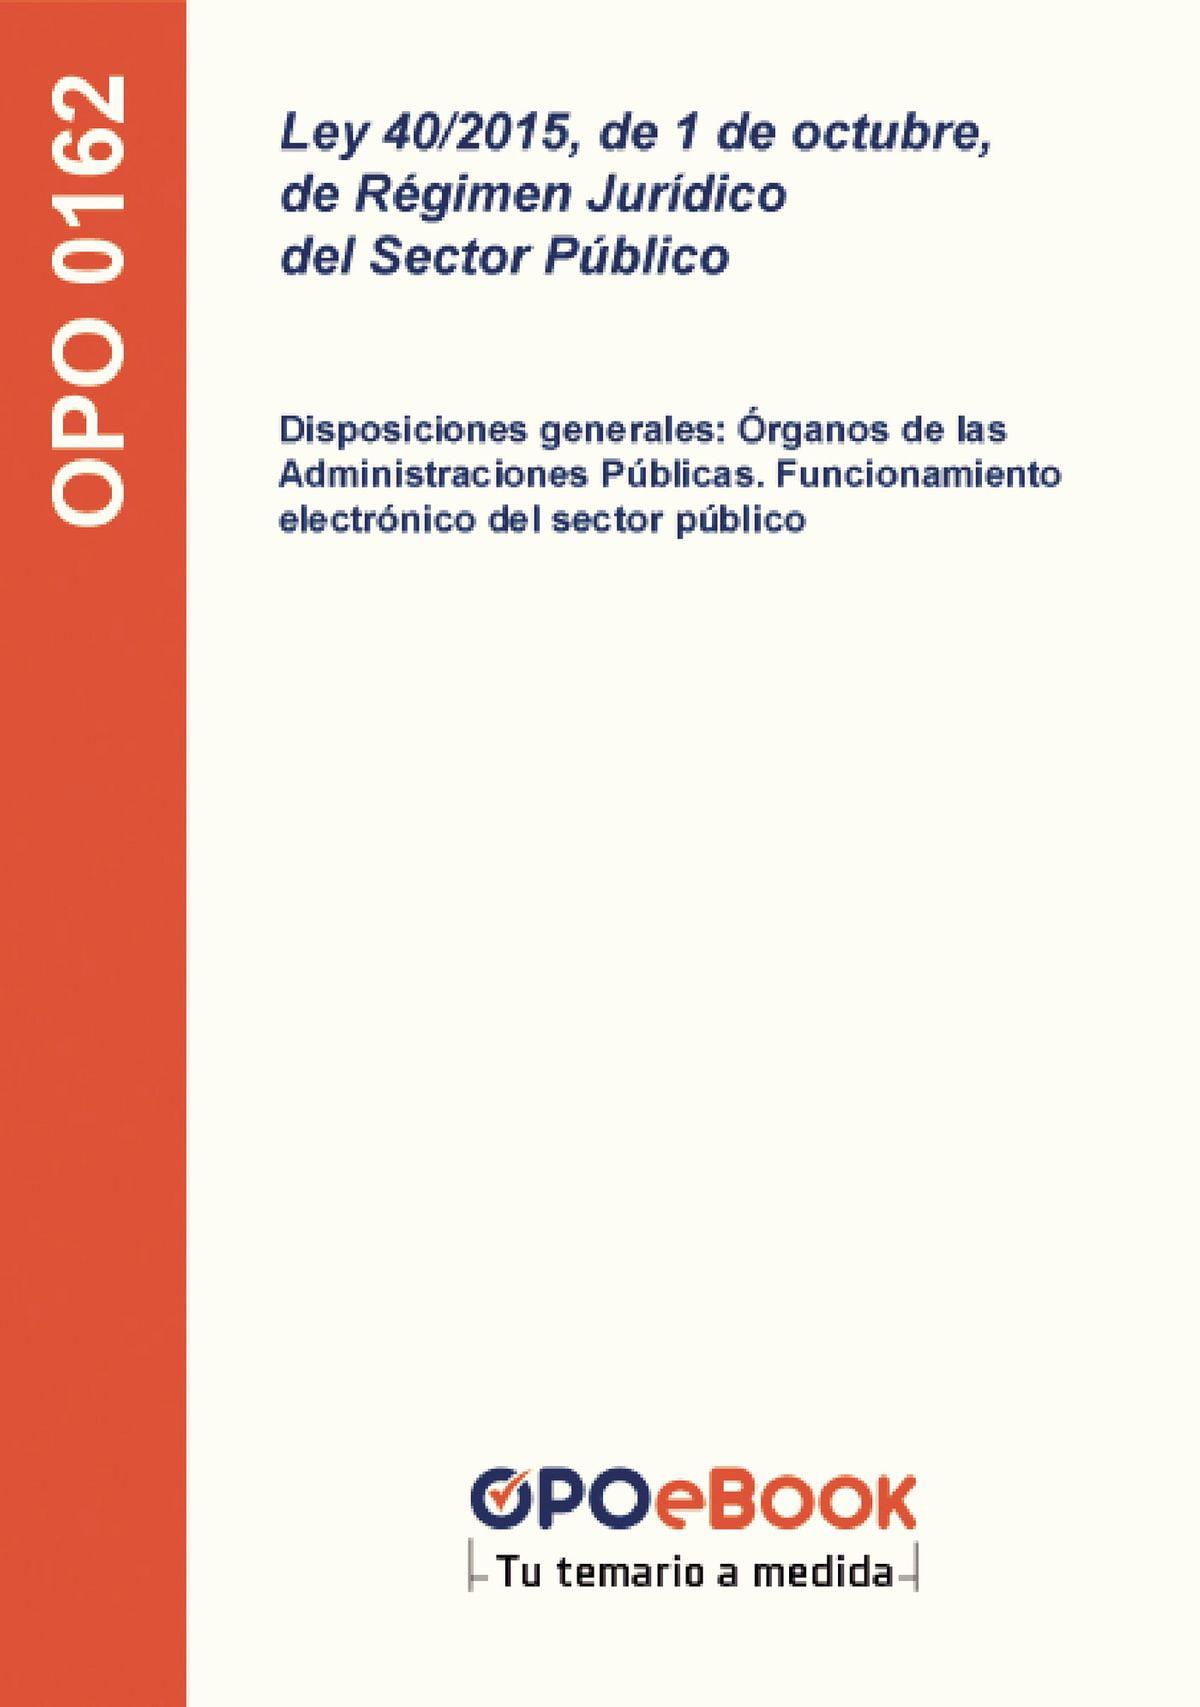 Ley 40 2015 De 1 De Octubre De Régimen Jurídico Del Sector Público Ebook Walmart Com Walmart Com